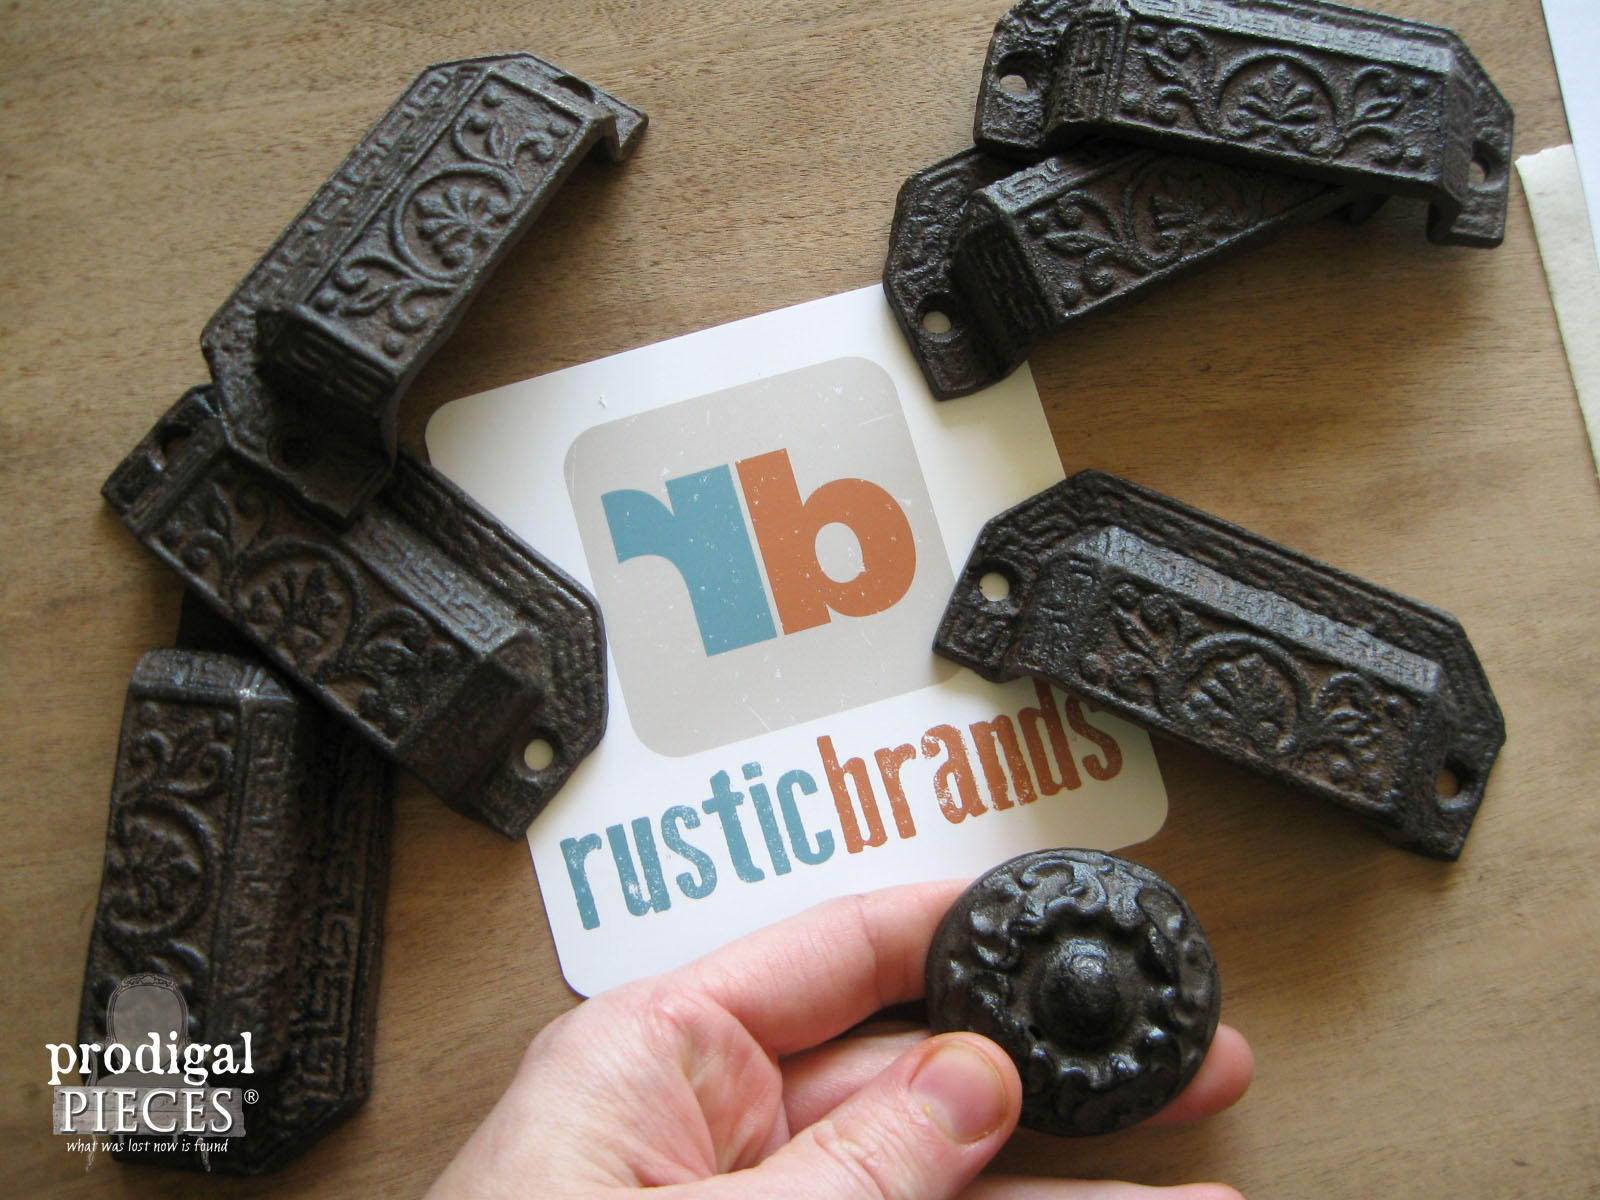 Rustic Brands Cast Iron Pulls | Prodigal Pieces | www.prodigalpieces.com